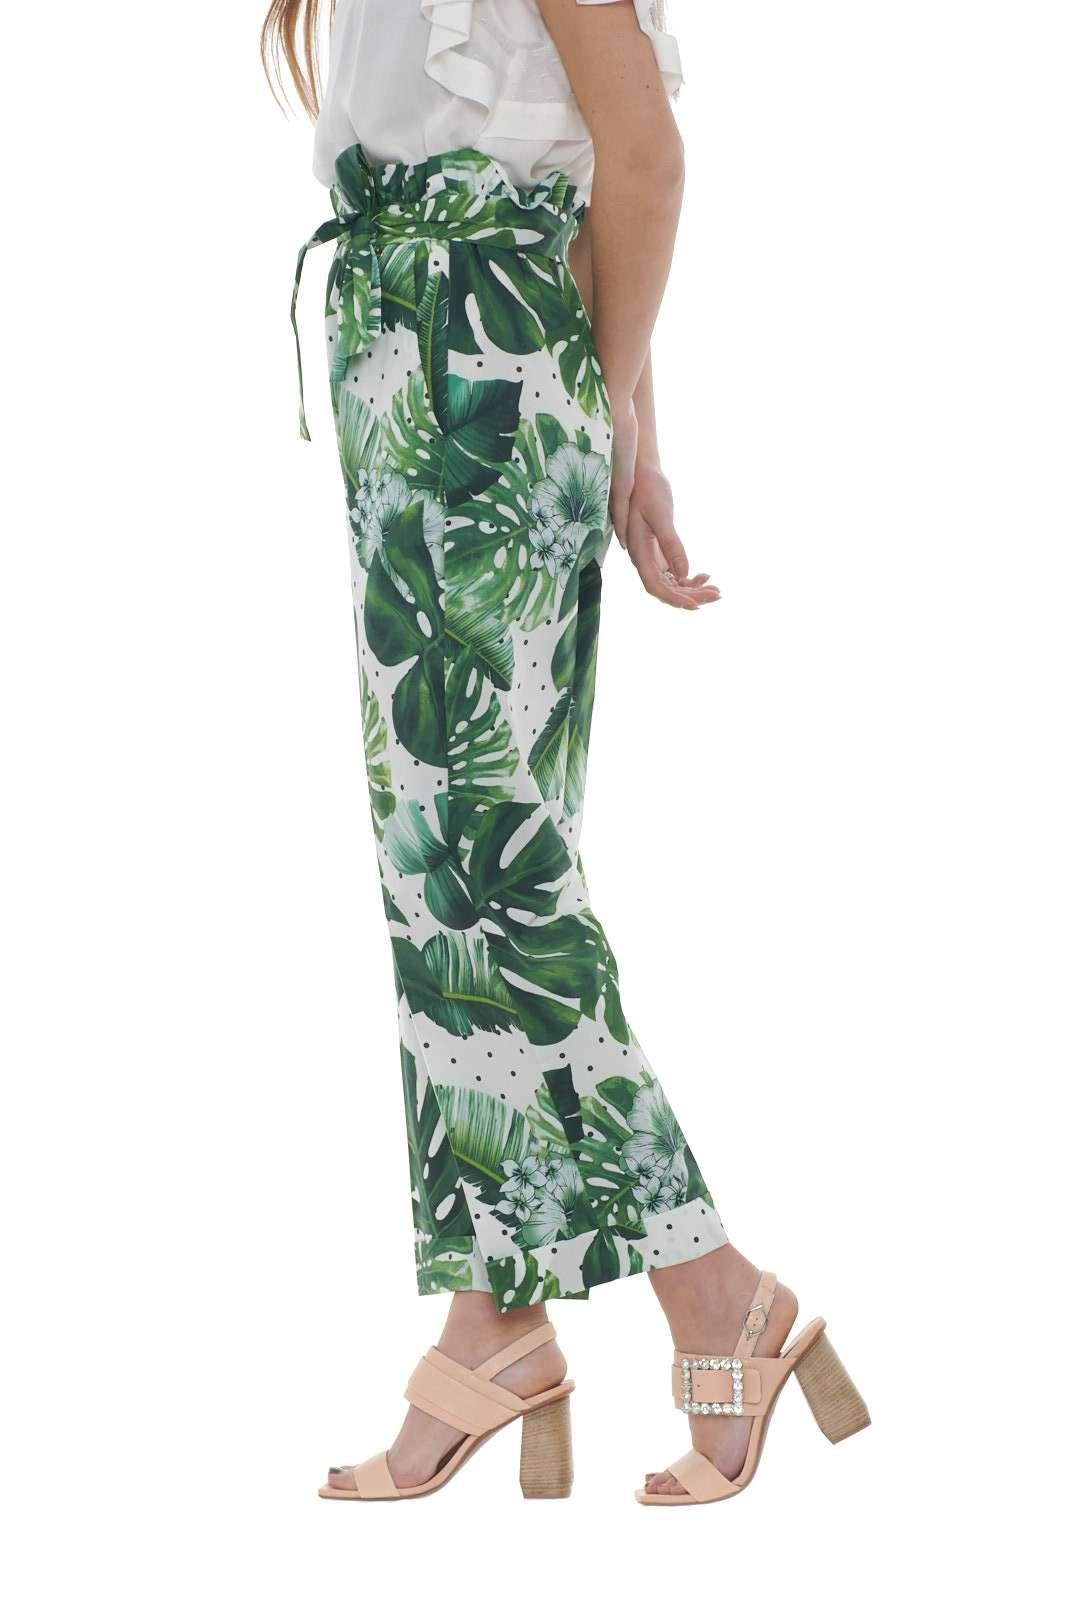 https://www.parmax.com/media/catalog/product/a/i/PE-outlet_parmax-pantaloni-donna-TwinSet-201TP2553-B.jpg